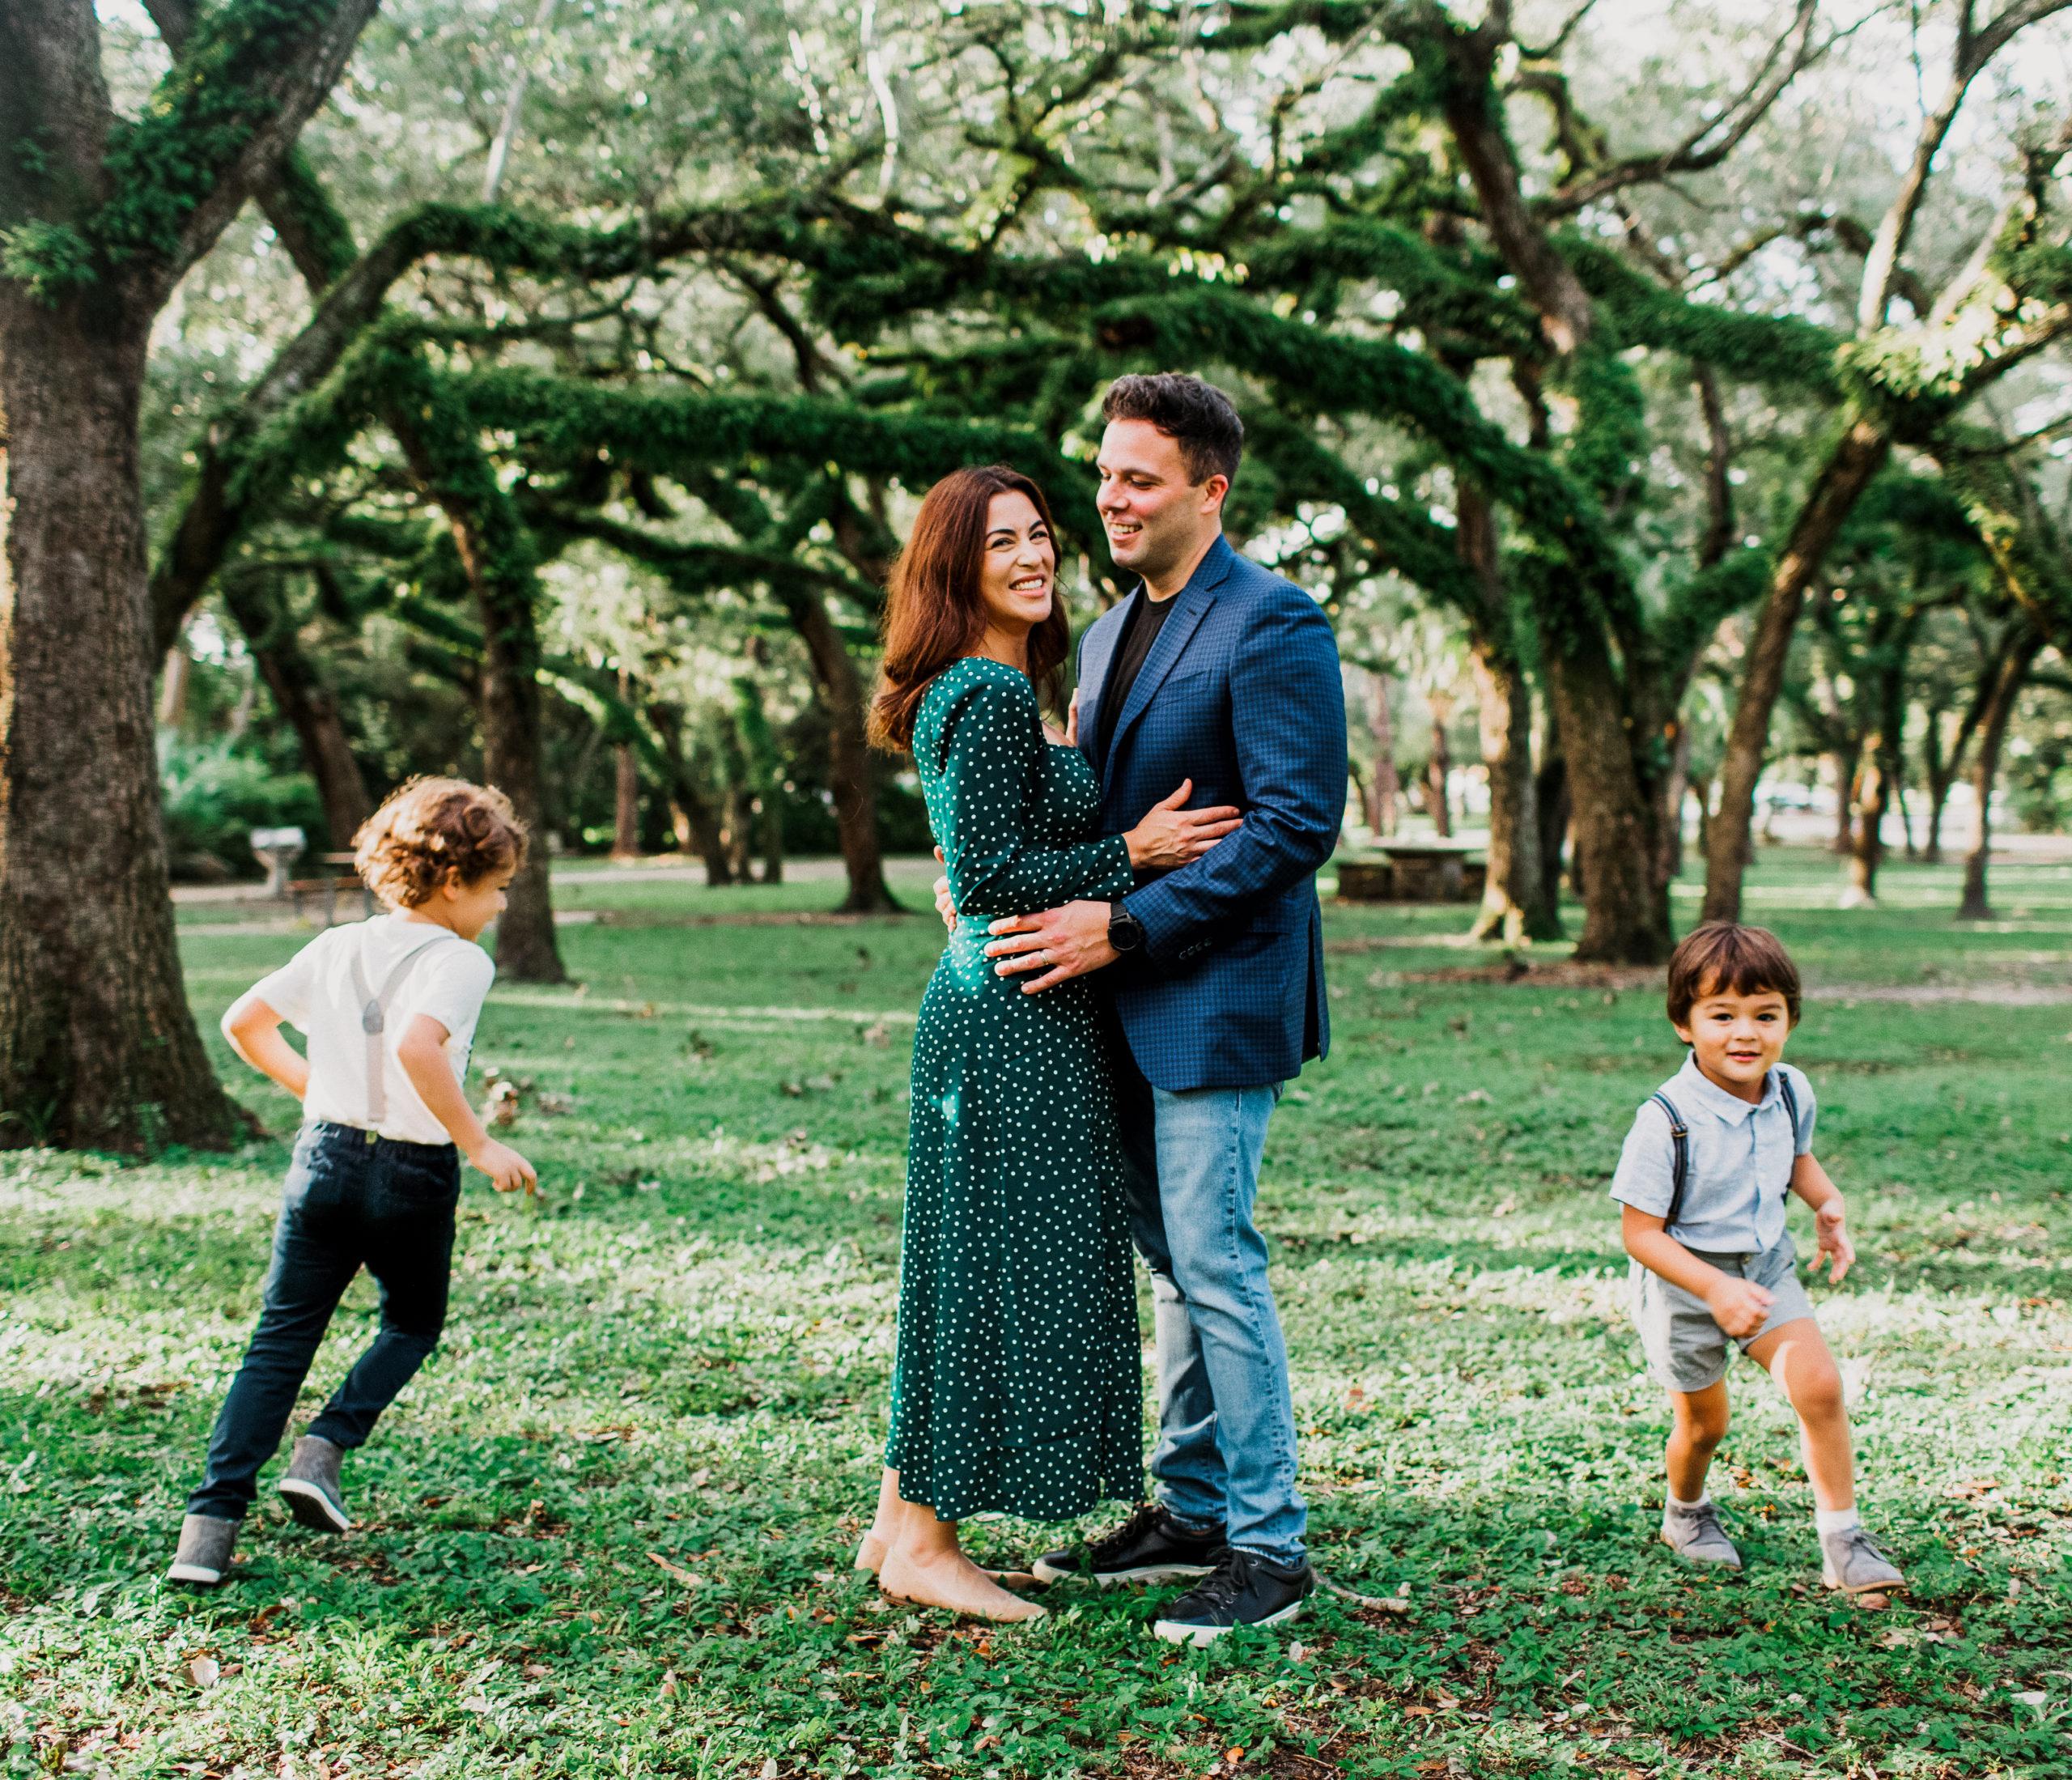 MiamiFamilyPhotoSession-14-scaled Family Photo Session at the Park - Villa Family